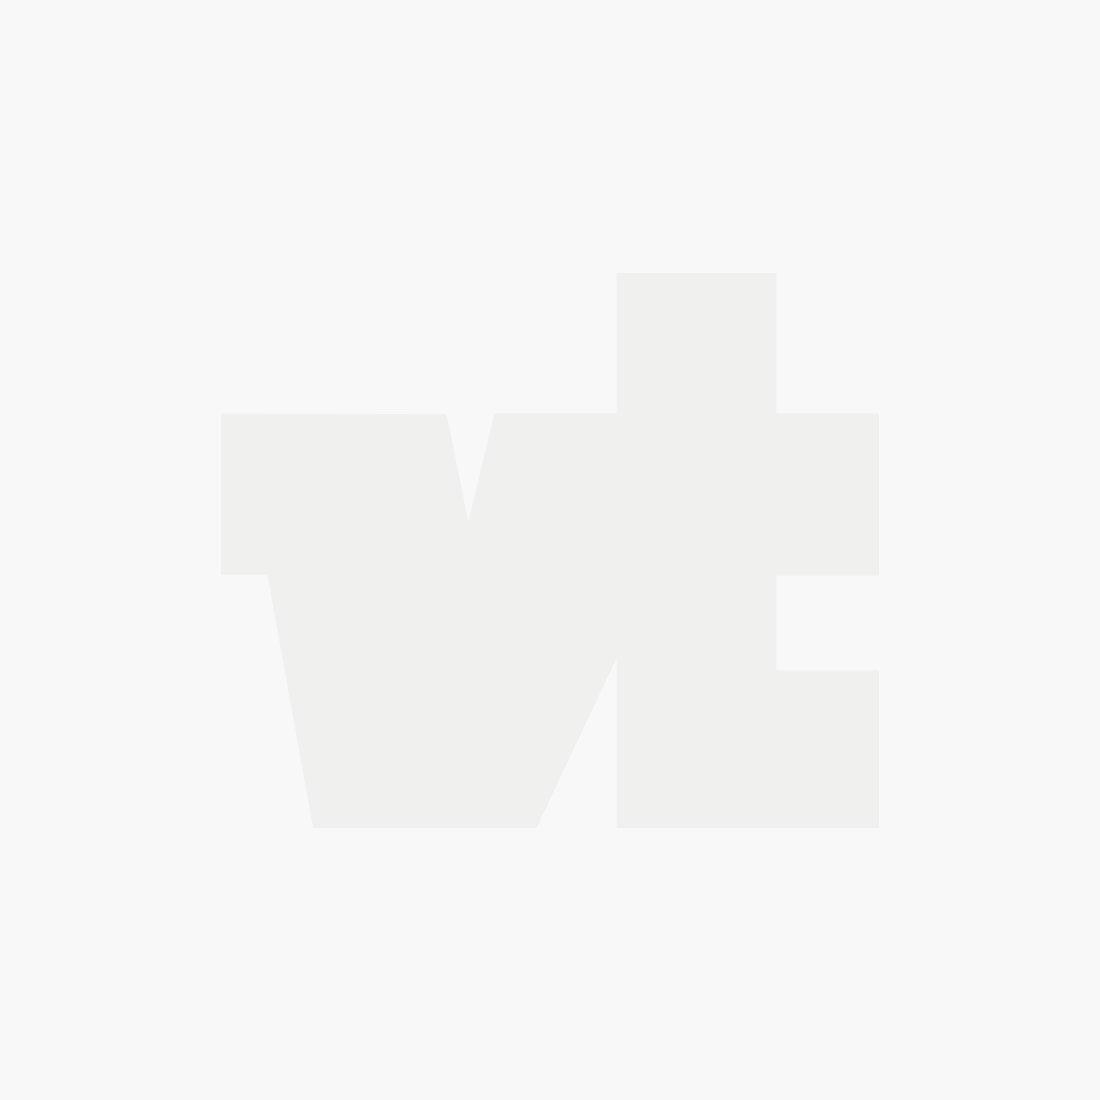 Lily embro blouse cream white